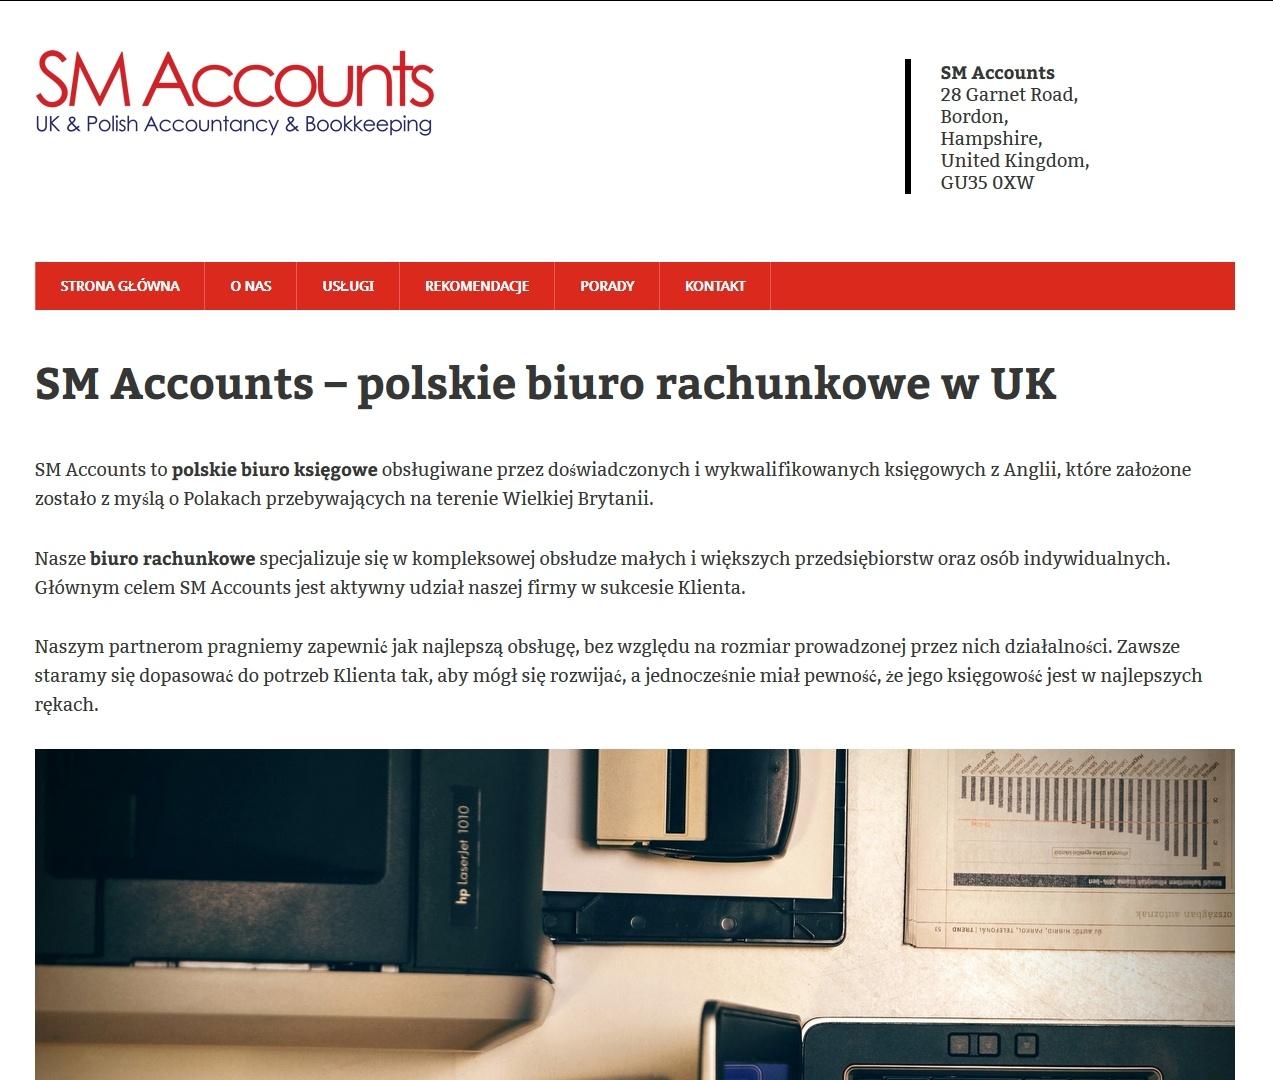 ksiegowauk.com - SM accounts homepage design